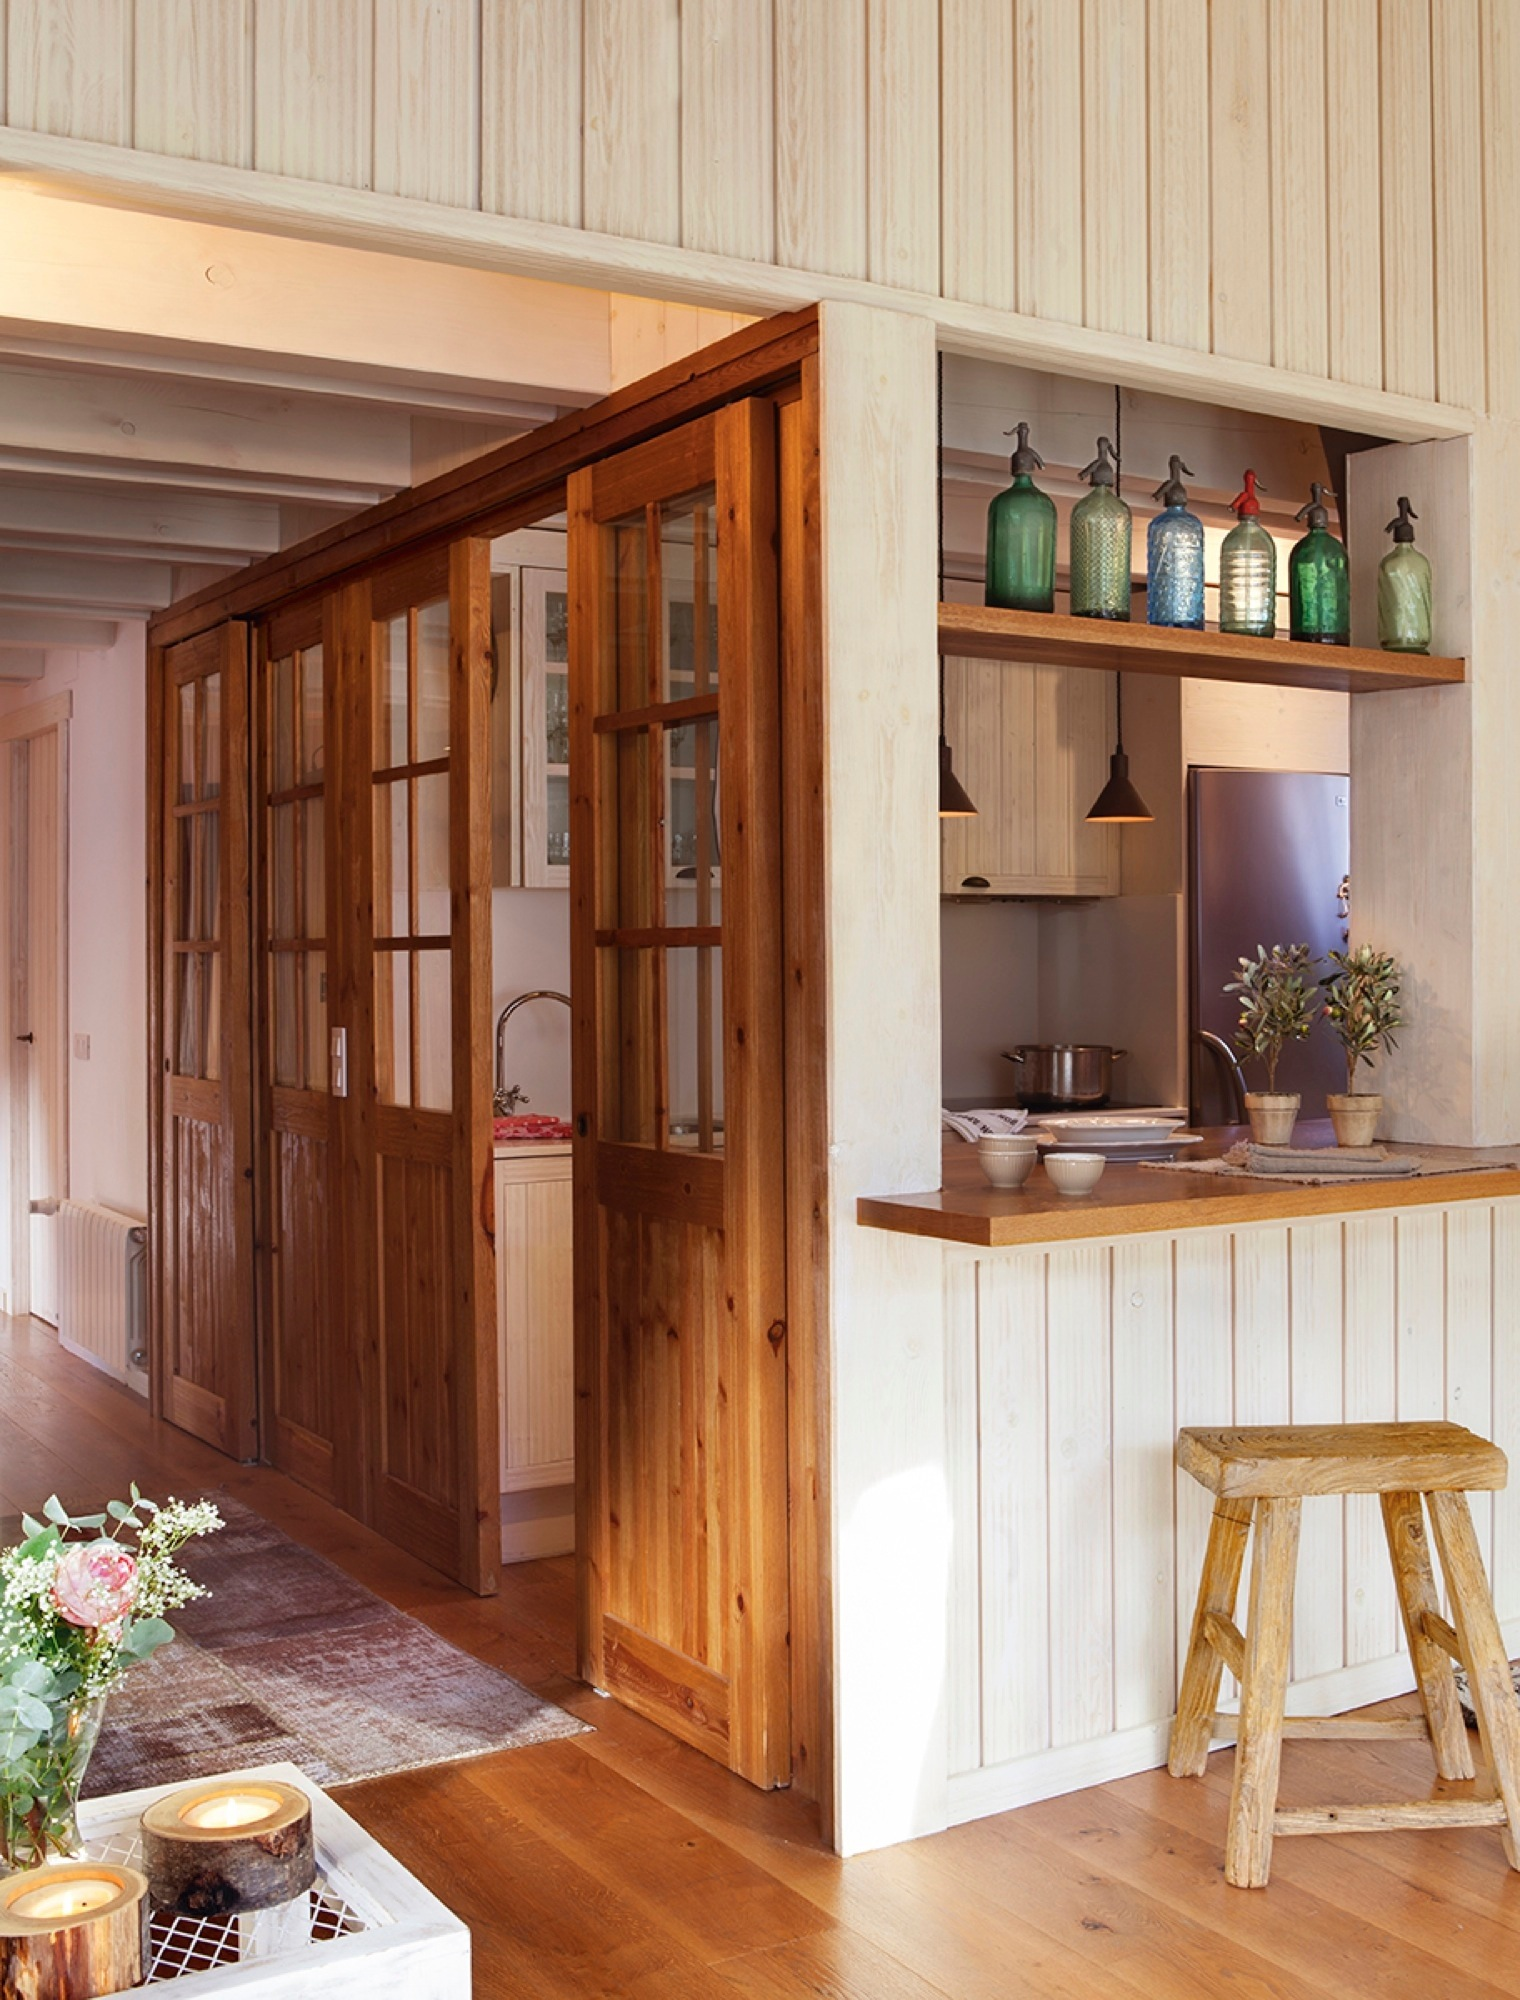 Puertas correderas de cristal de madera o empotradas - Paredes para cocina ...